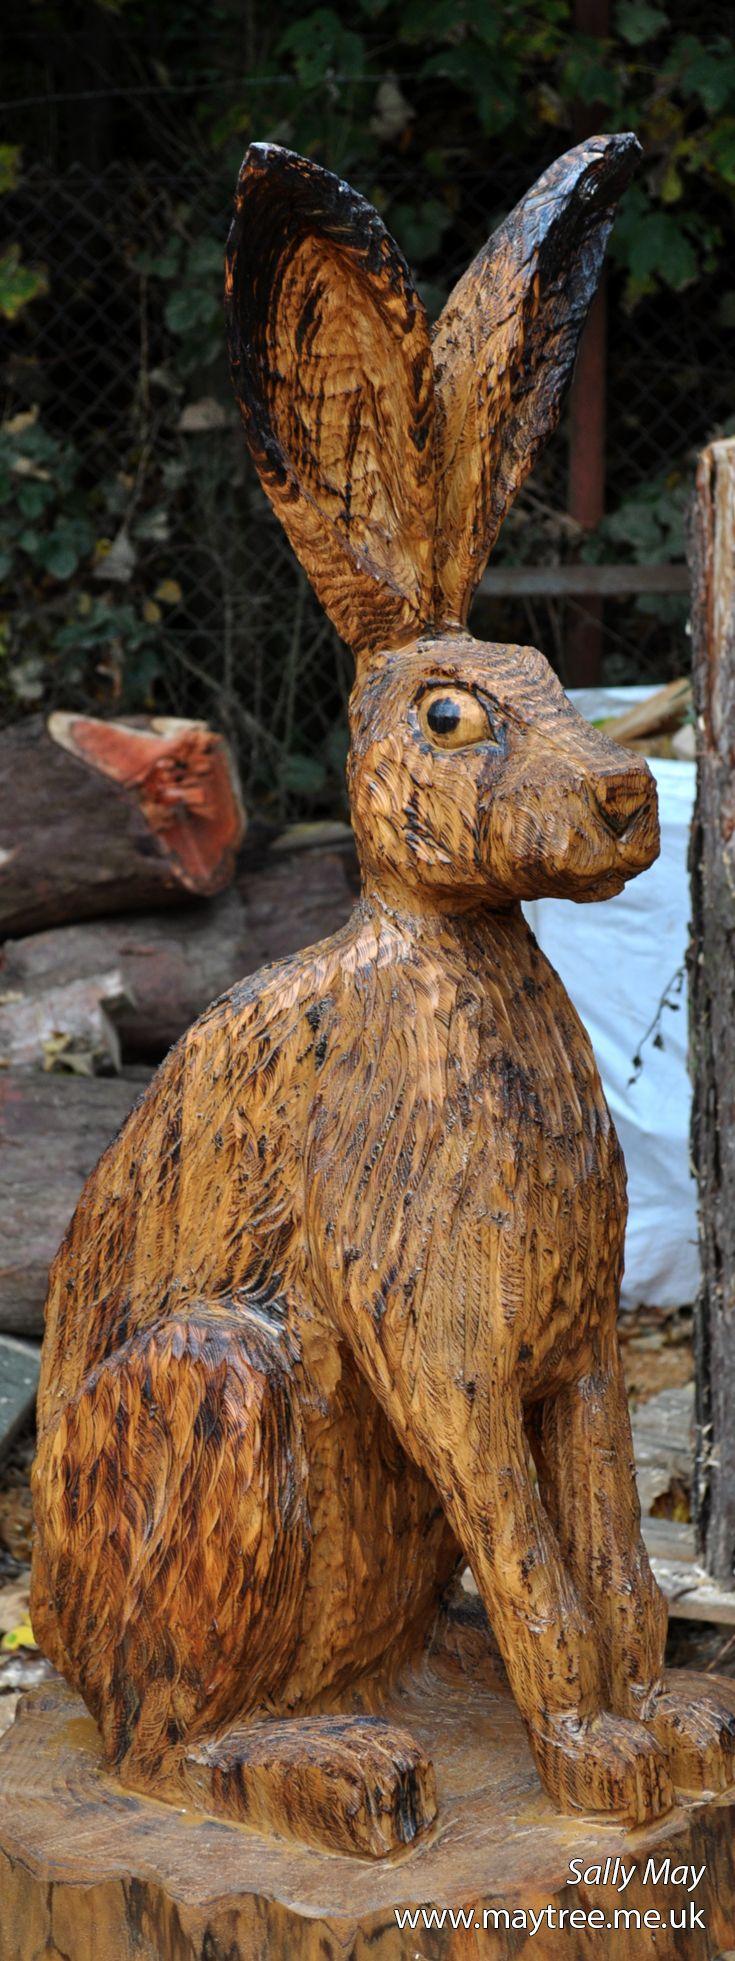 Beste ideeën over kettingzaag houtsnijwerk op pinterest